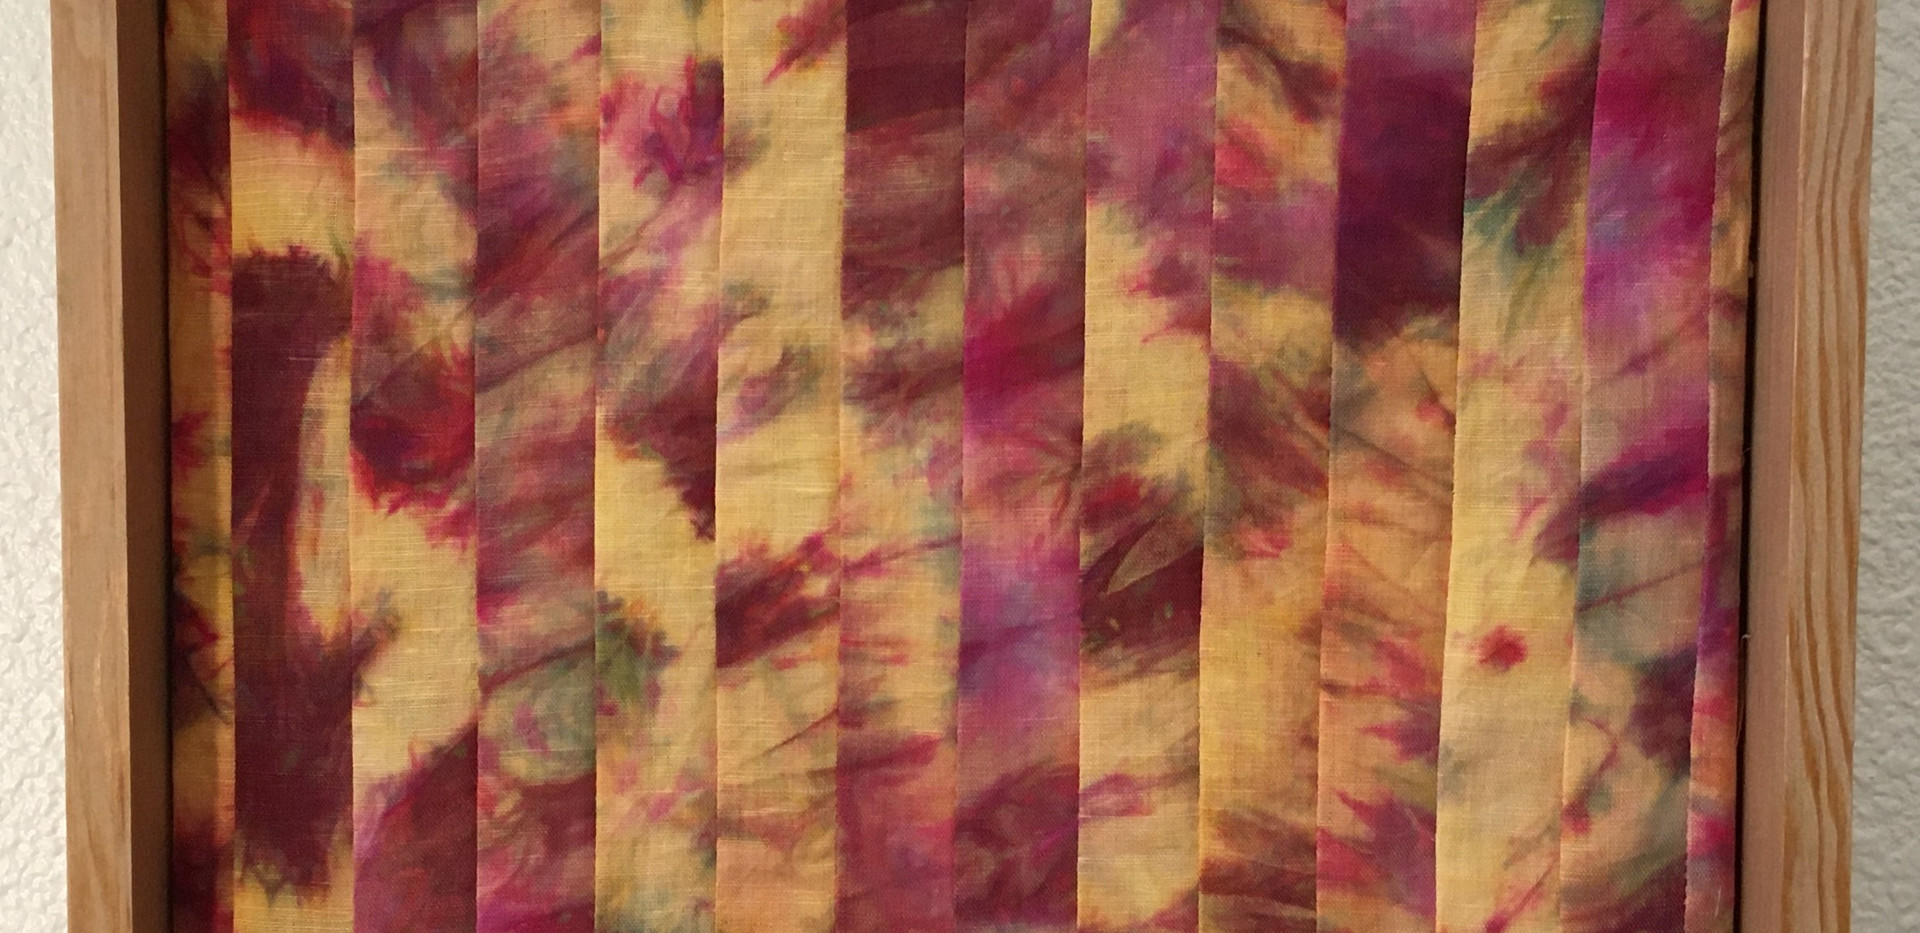 Venus, 1'x1' Hand dyed Panel, 2021